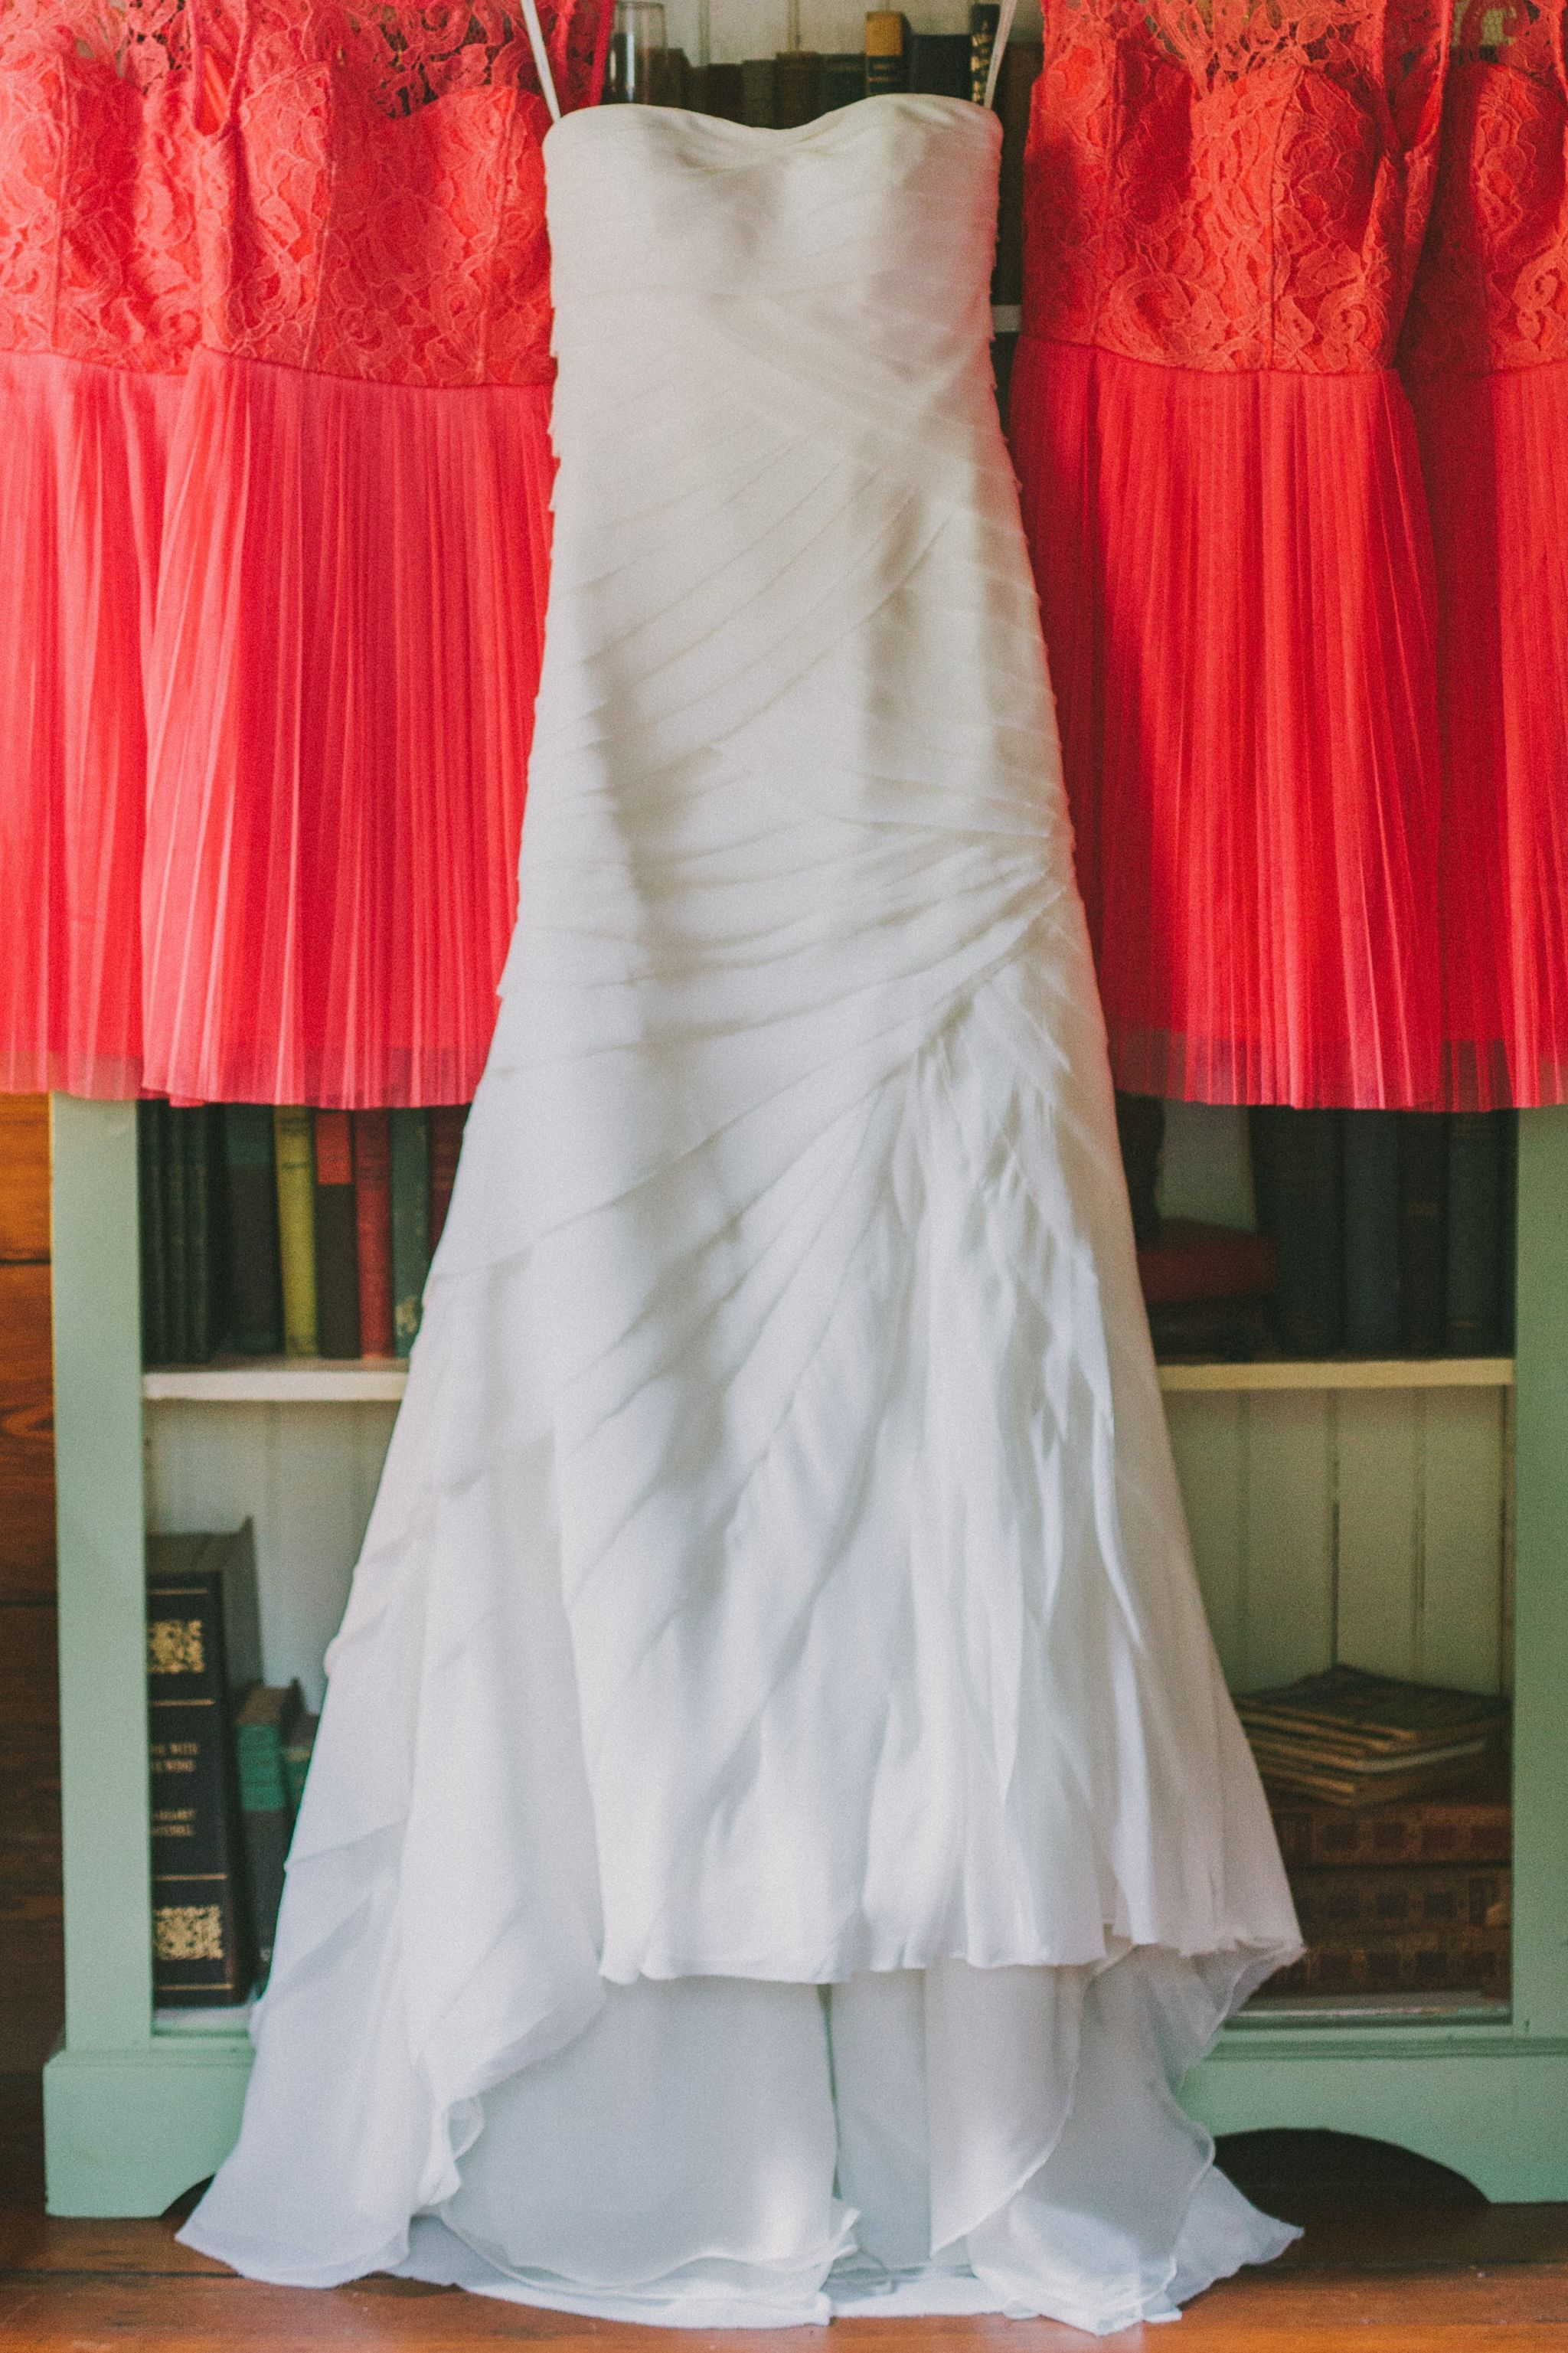 Red wedding dresses vera wang  Vera Wang White VW  Size   Used Wedding Dresses  Vera